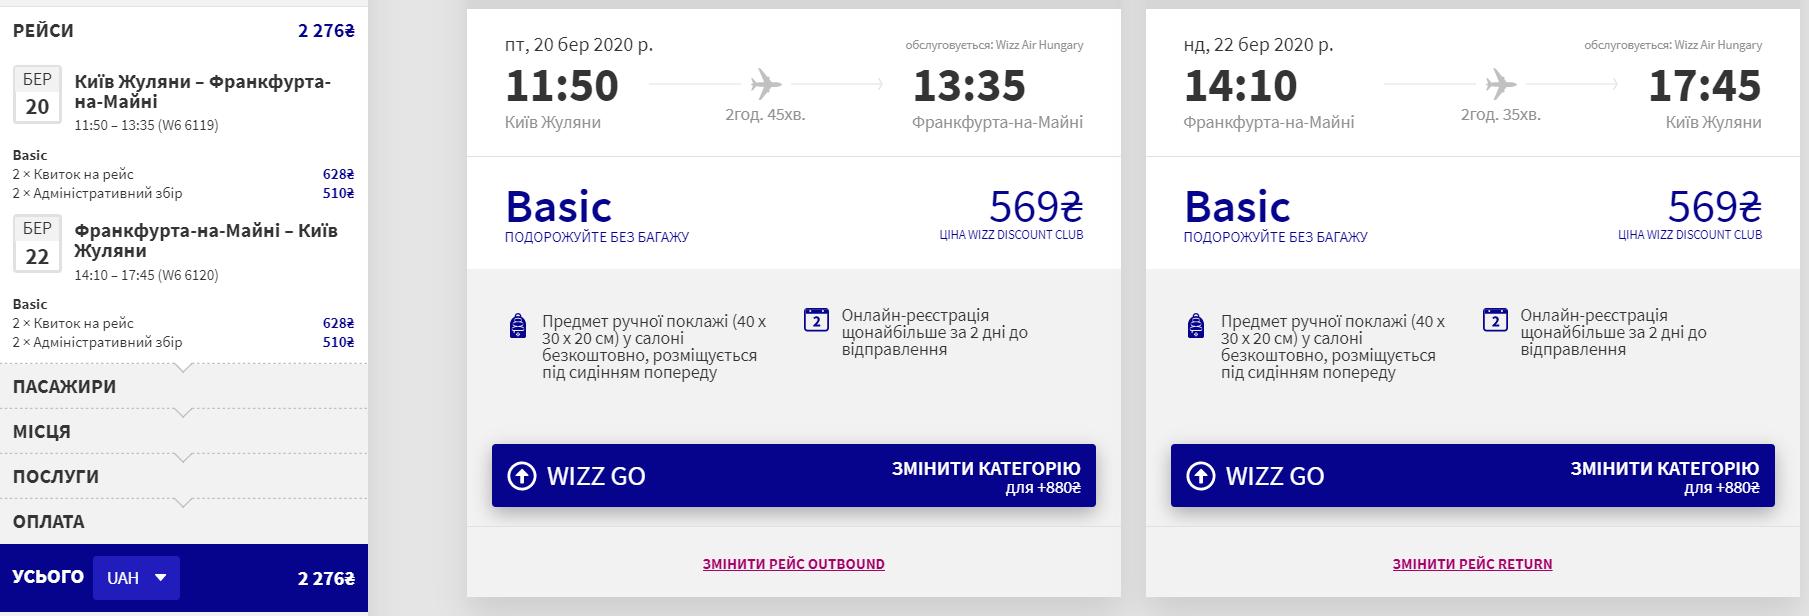 Київ - Франкфурт - Київ >>